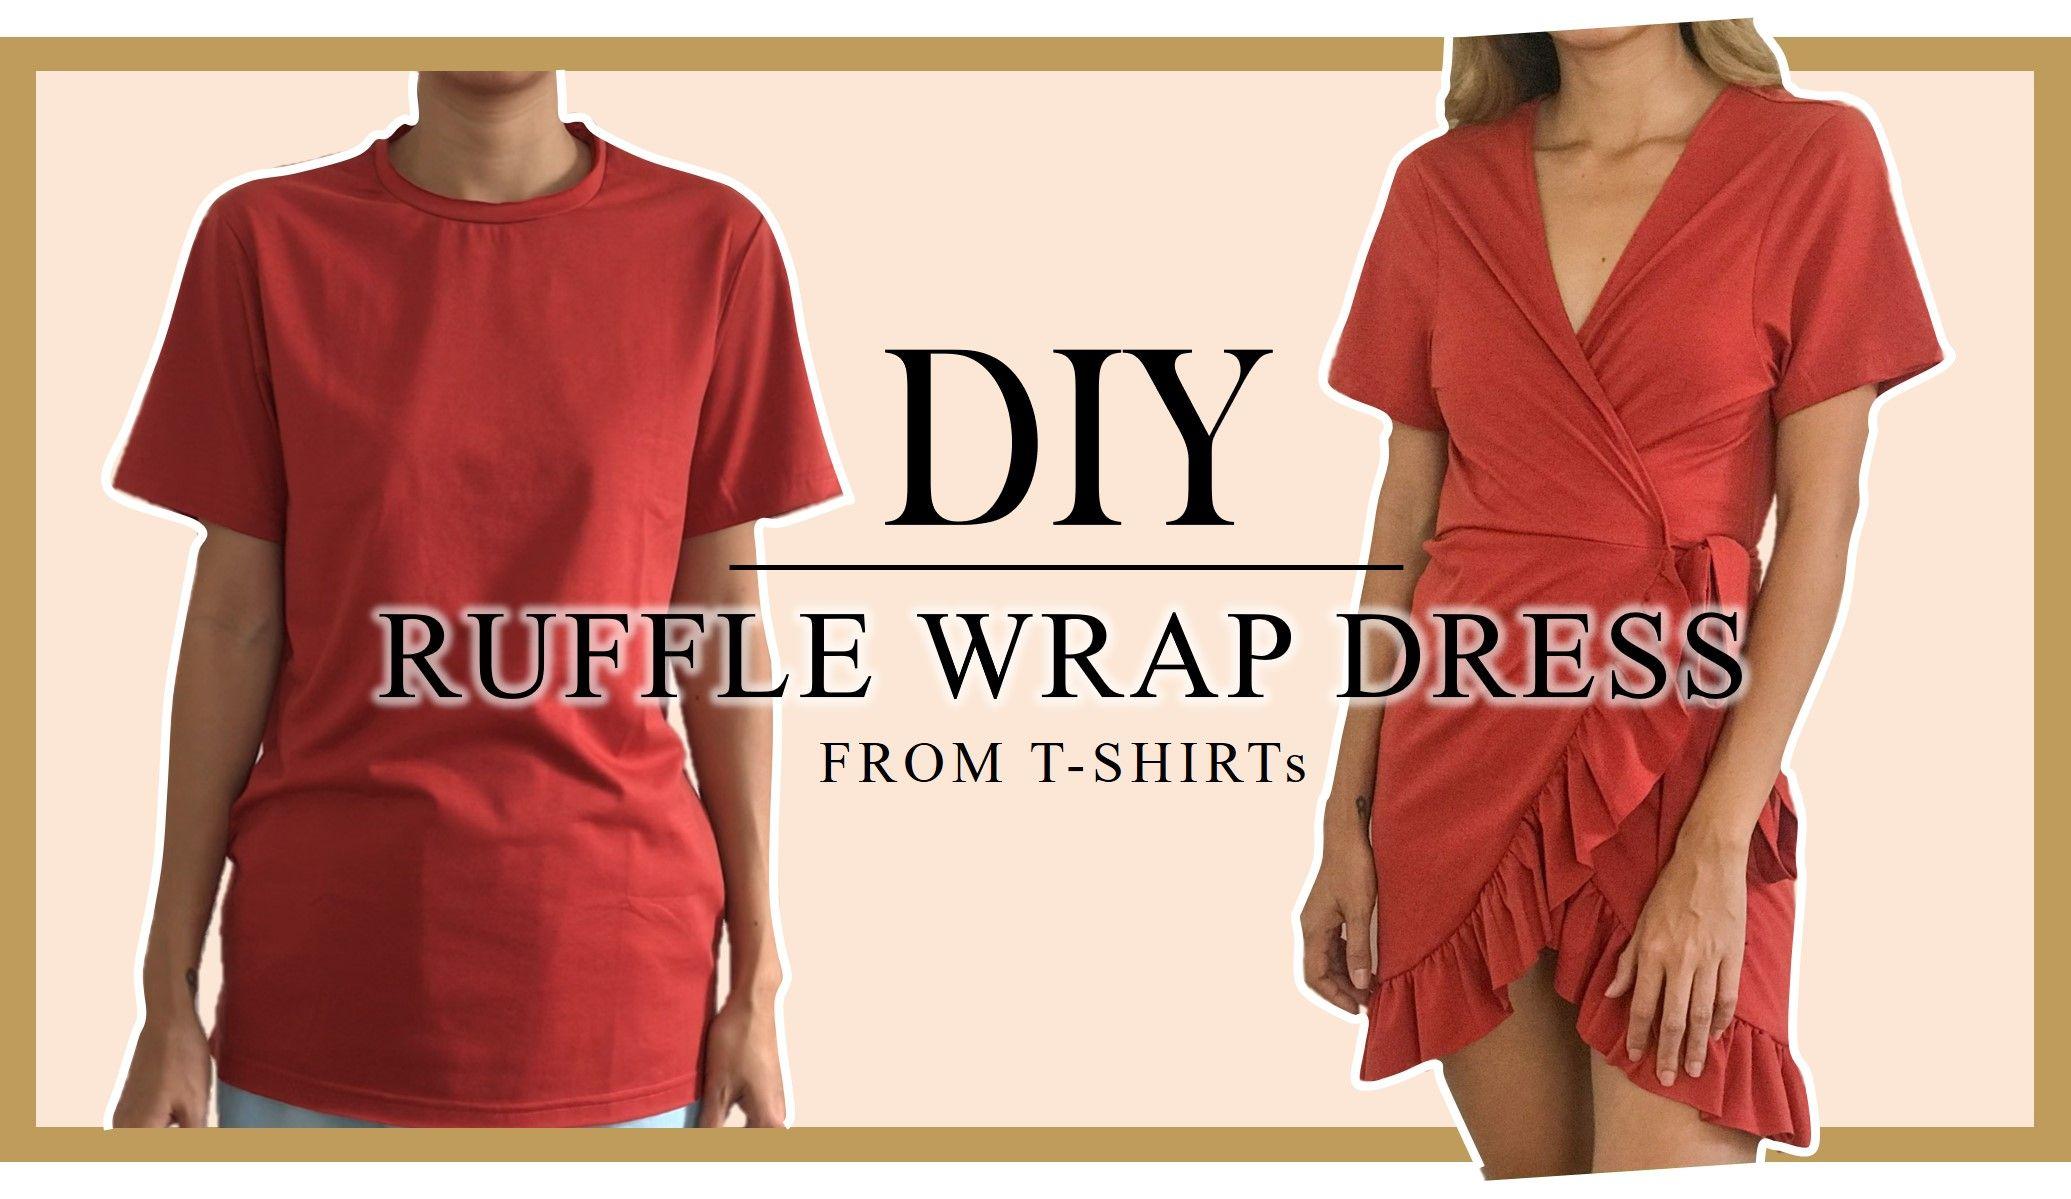 Diy Ruffle Wrap Dress From T Shirt Refashion T Shirt Into Ruffle Wrap Dress Wrap Dresses Diy Ruffle Wrap Dress Tshirt Refashion [ 1199 x 2071 Pixel ]